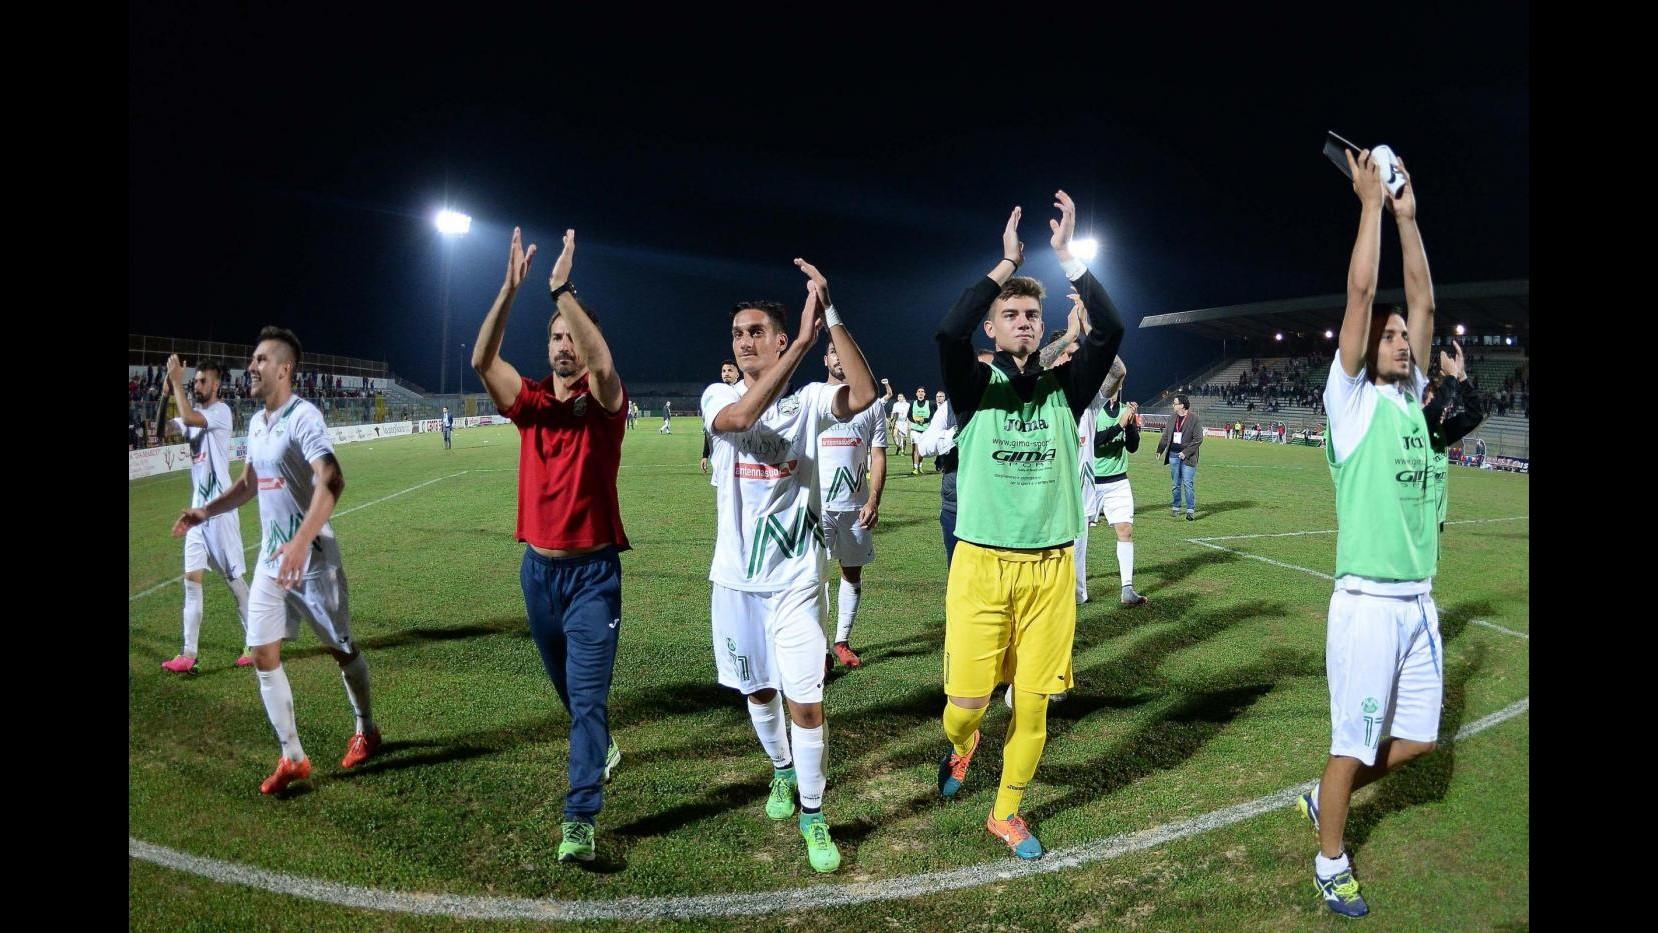 Serie C, Casertana-Monopoli 0-3